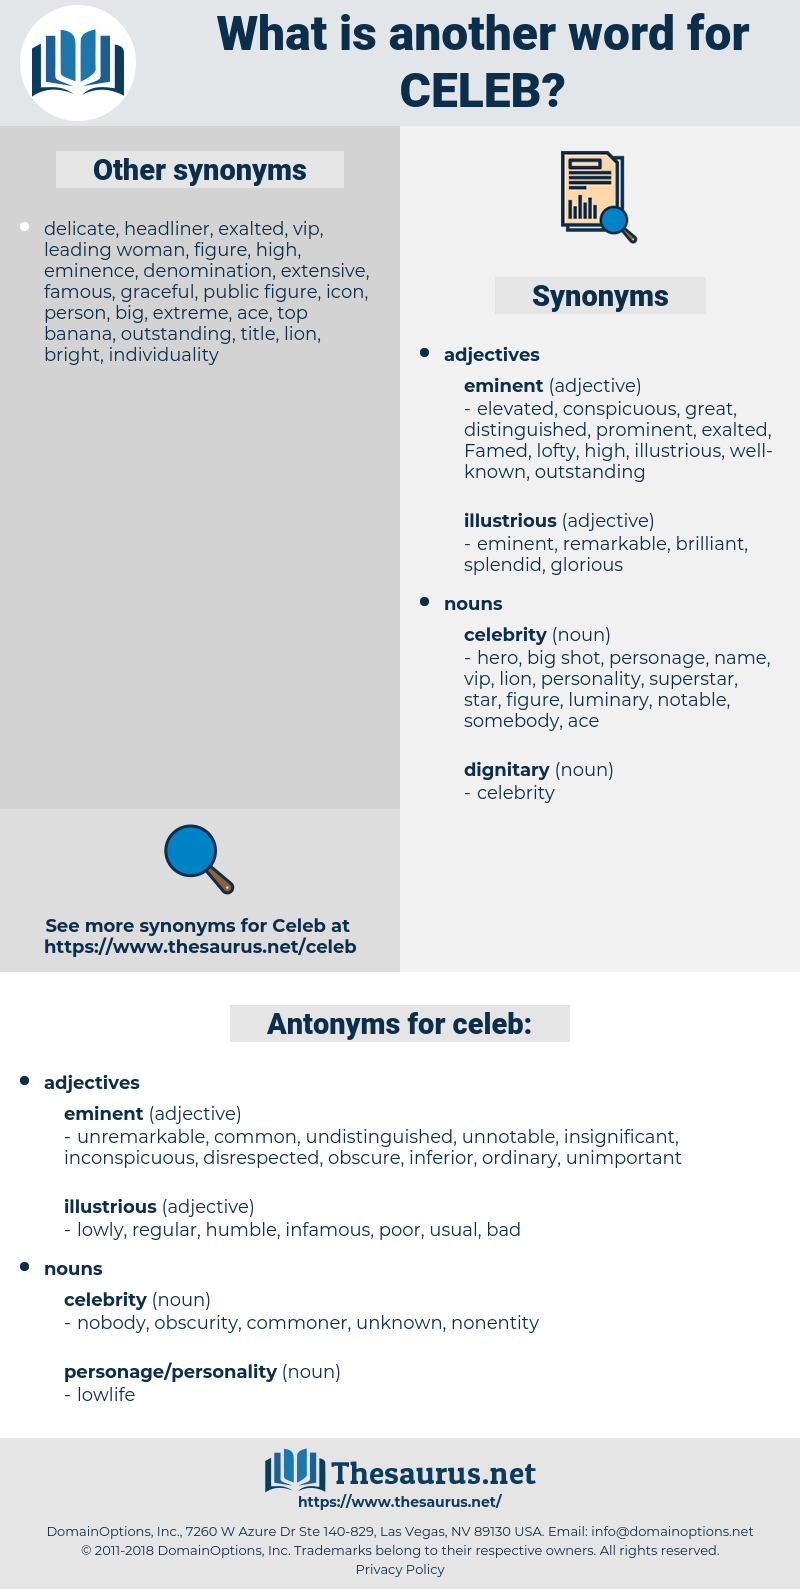 celeb, synonym celeb, another word for celeb, words like celeb, thesaurus celeb